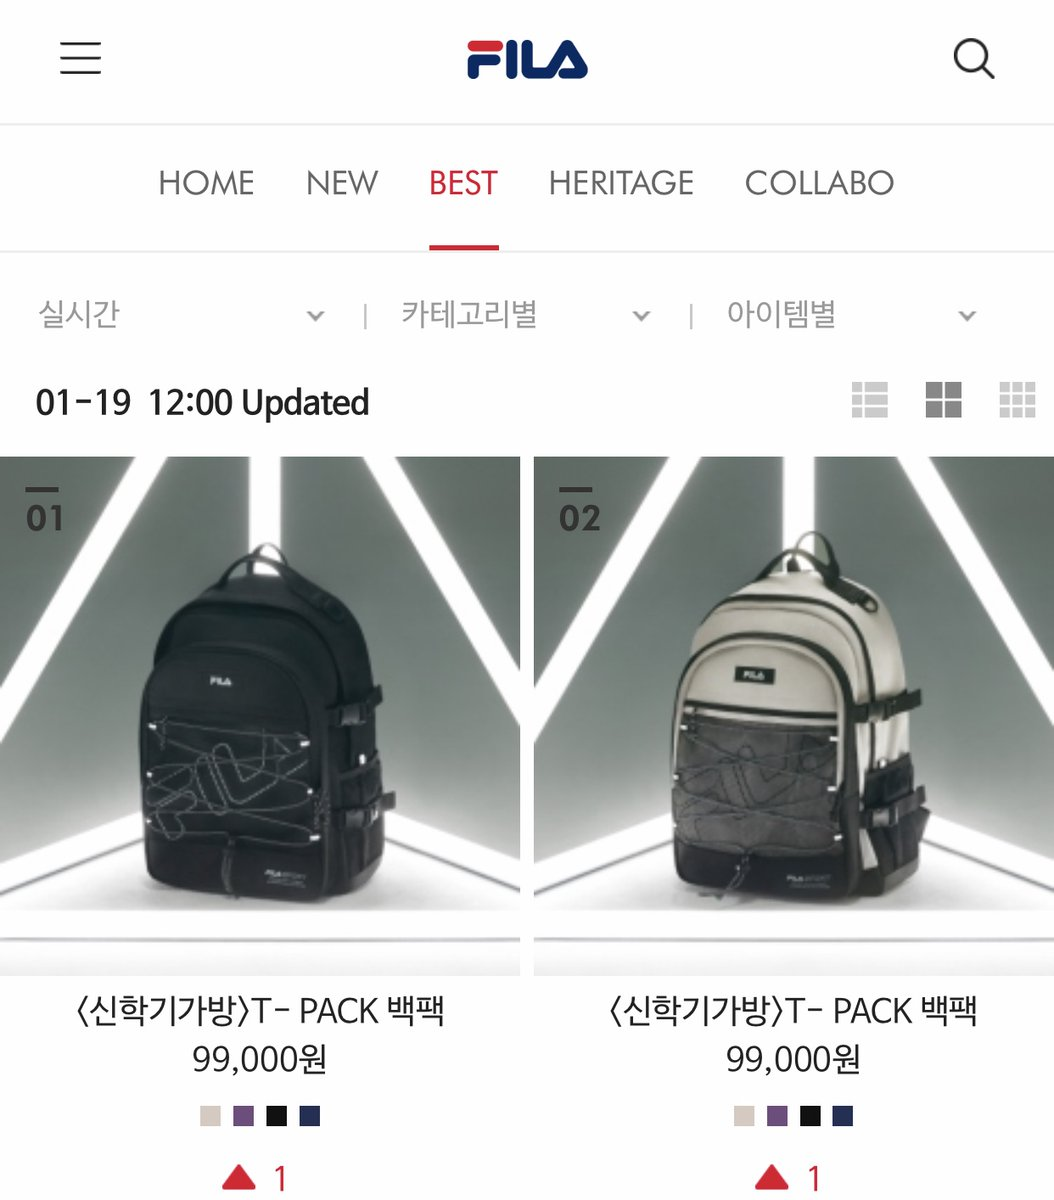 Hoseok's bag for Fila is now #1 Best Seller on the website!   #jhope #제이홉 #방탄소년단제이홉 @BTS_twt<br>http://pic.twitter.com/CzpUsVFbI8